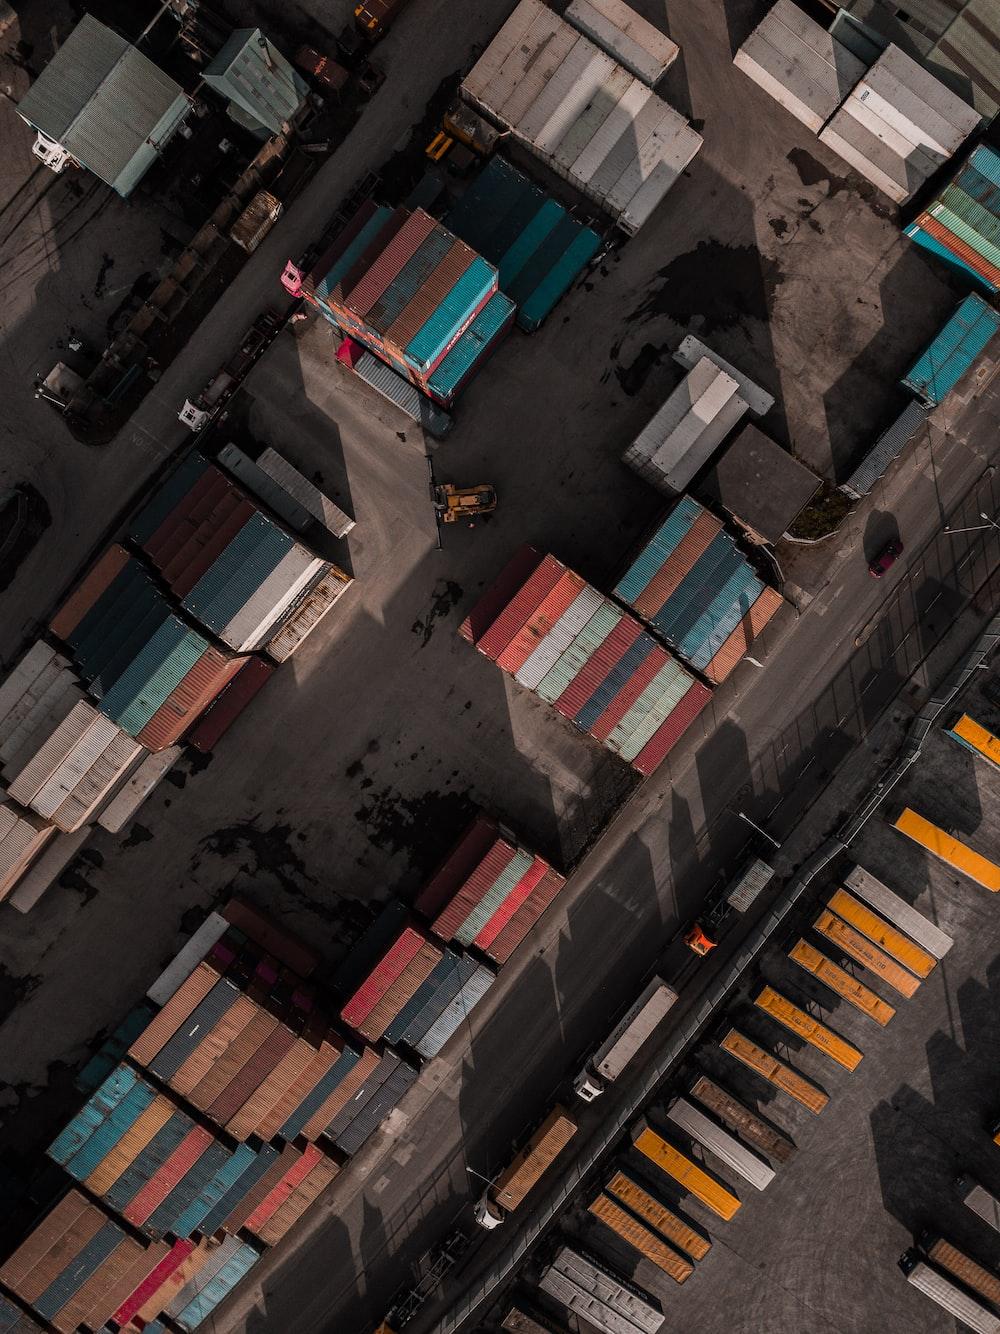 bird's eye view of intermodal container lot